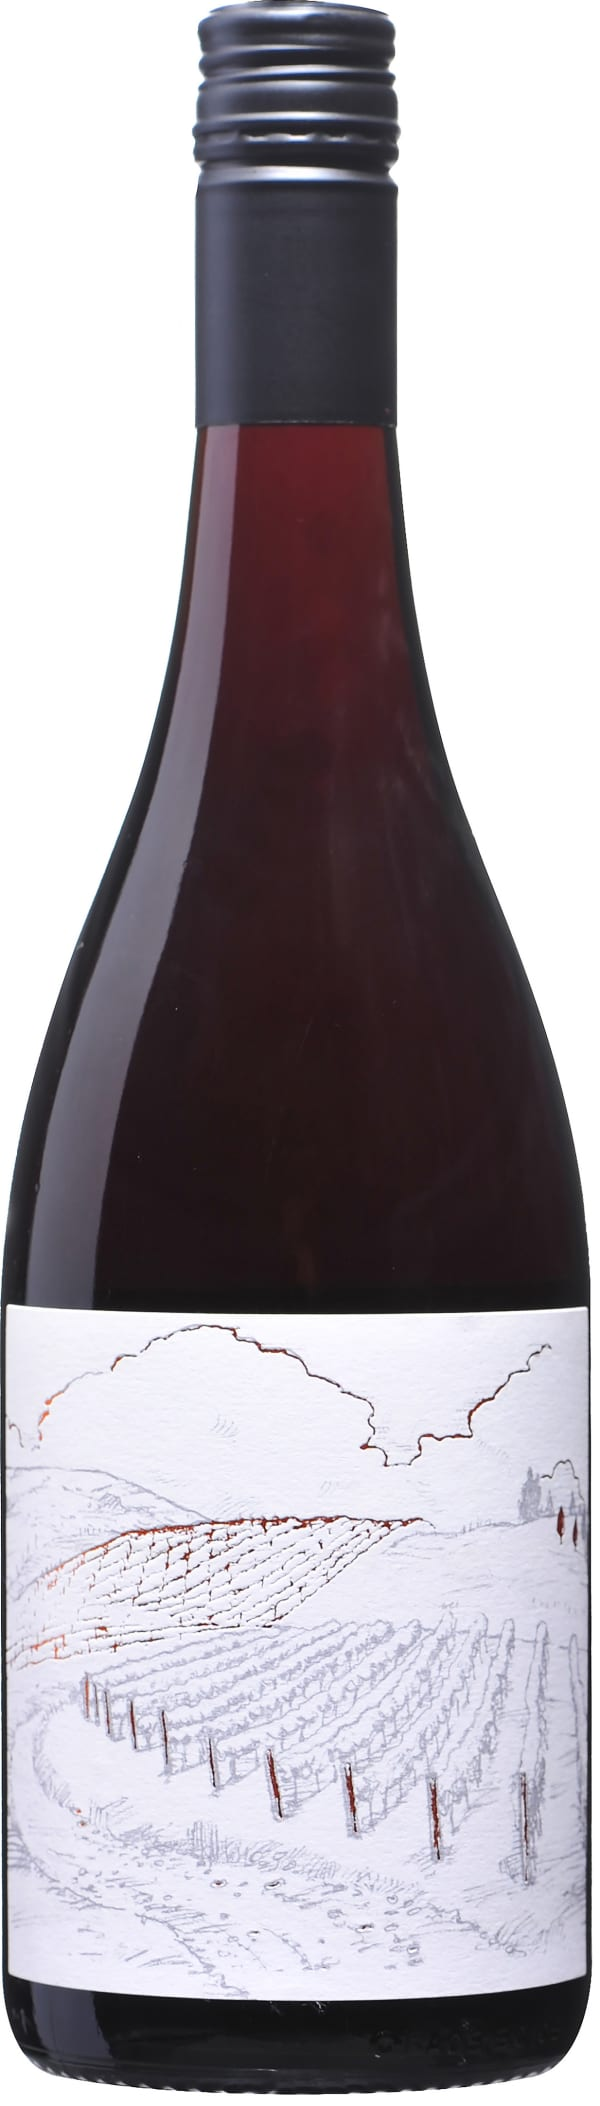 Greystone Vineyard Ferment Pinot Noir 2018